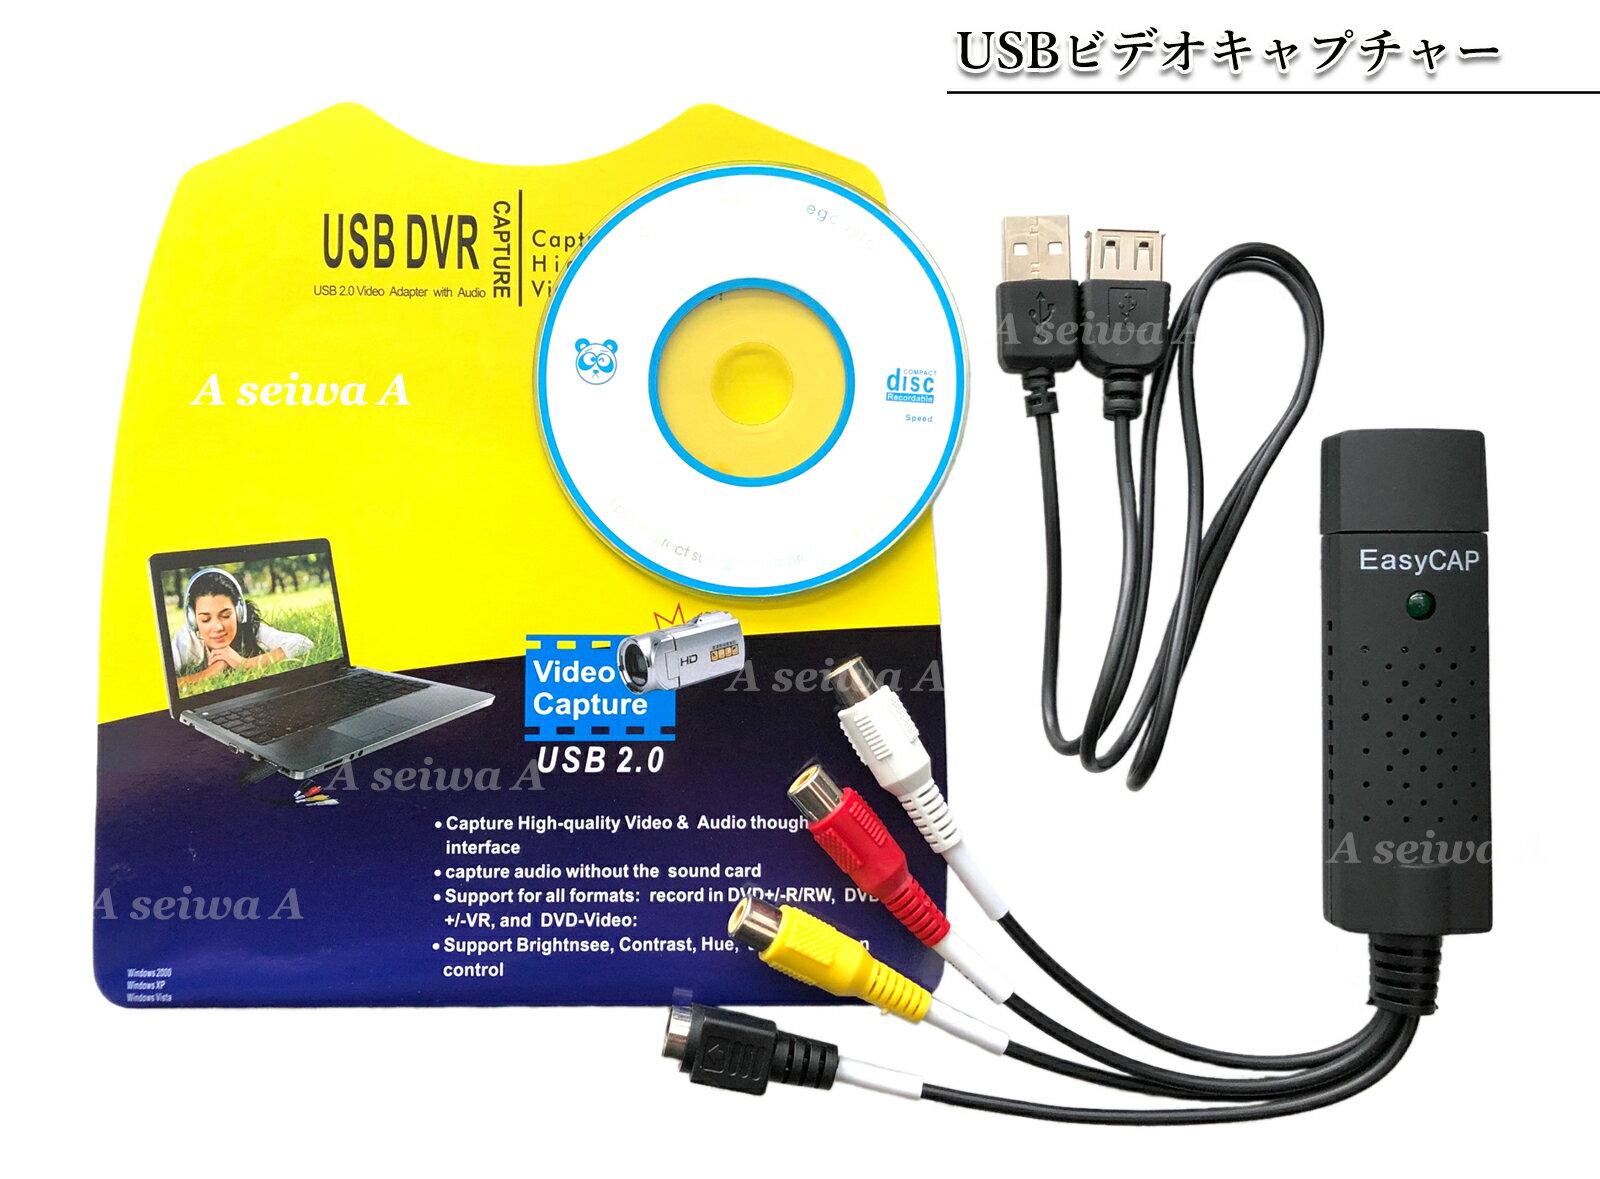 USBビデオキャプチャー EasyCAP 画像安定装置付き USBバスパワーで電源不要 編集ソフト 付属